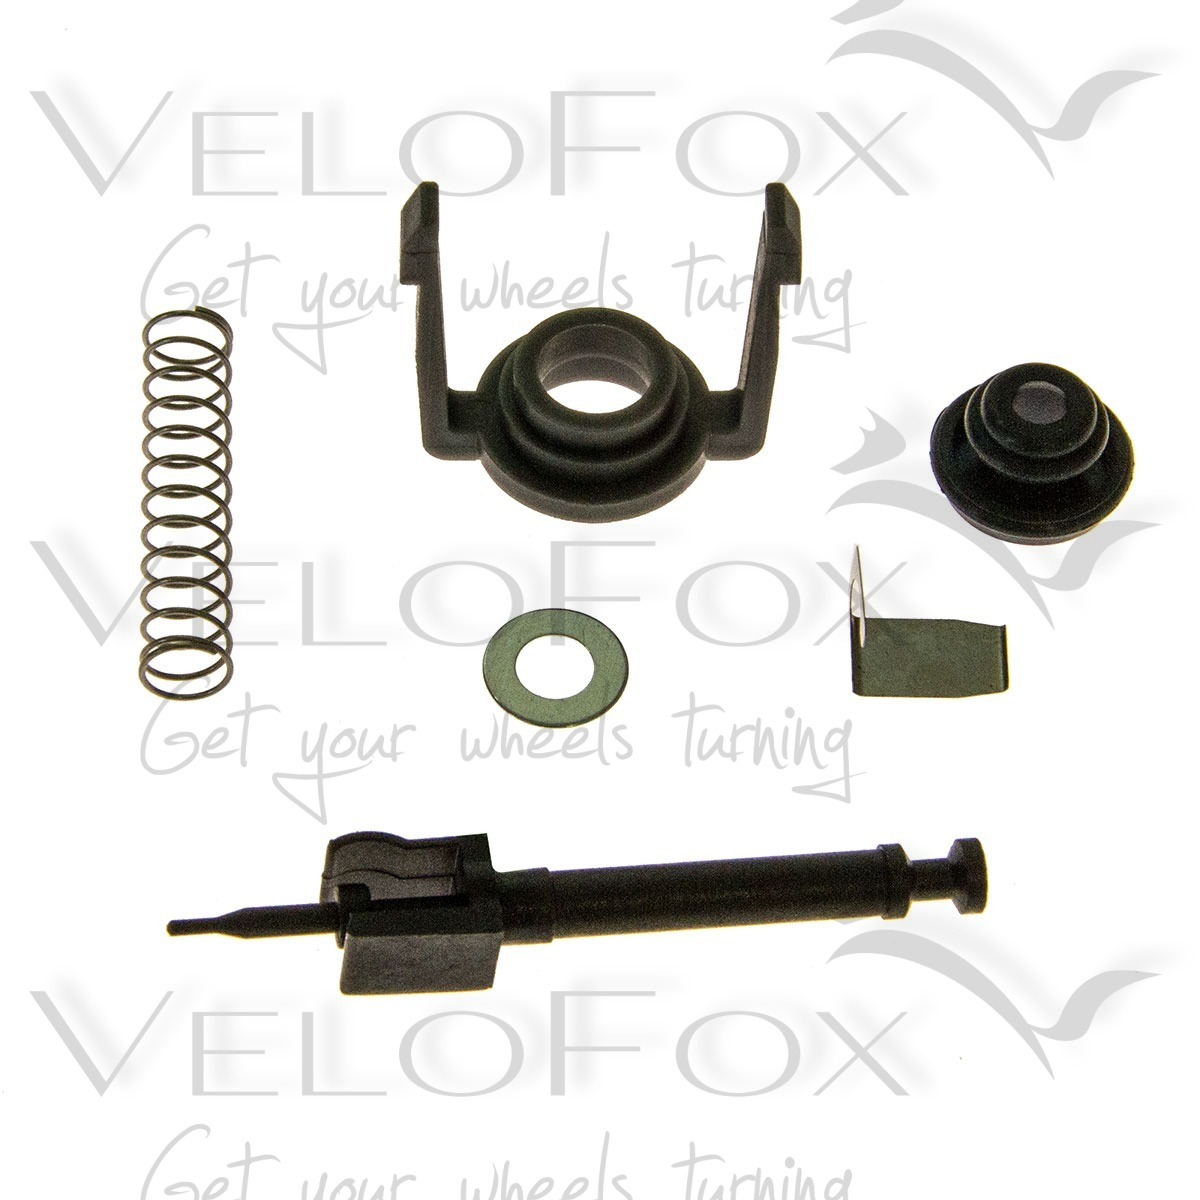 Yamaha FZR 1000 Genesis Exup 1989 Carb Choke Valve Repair Kit